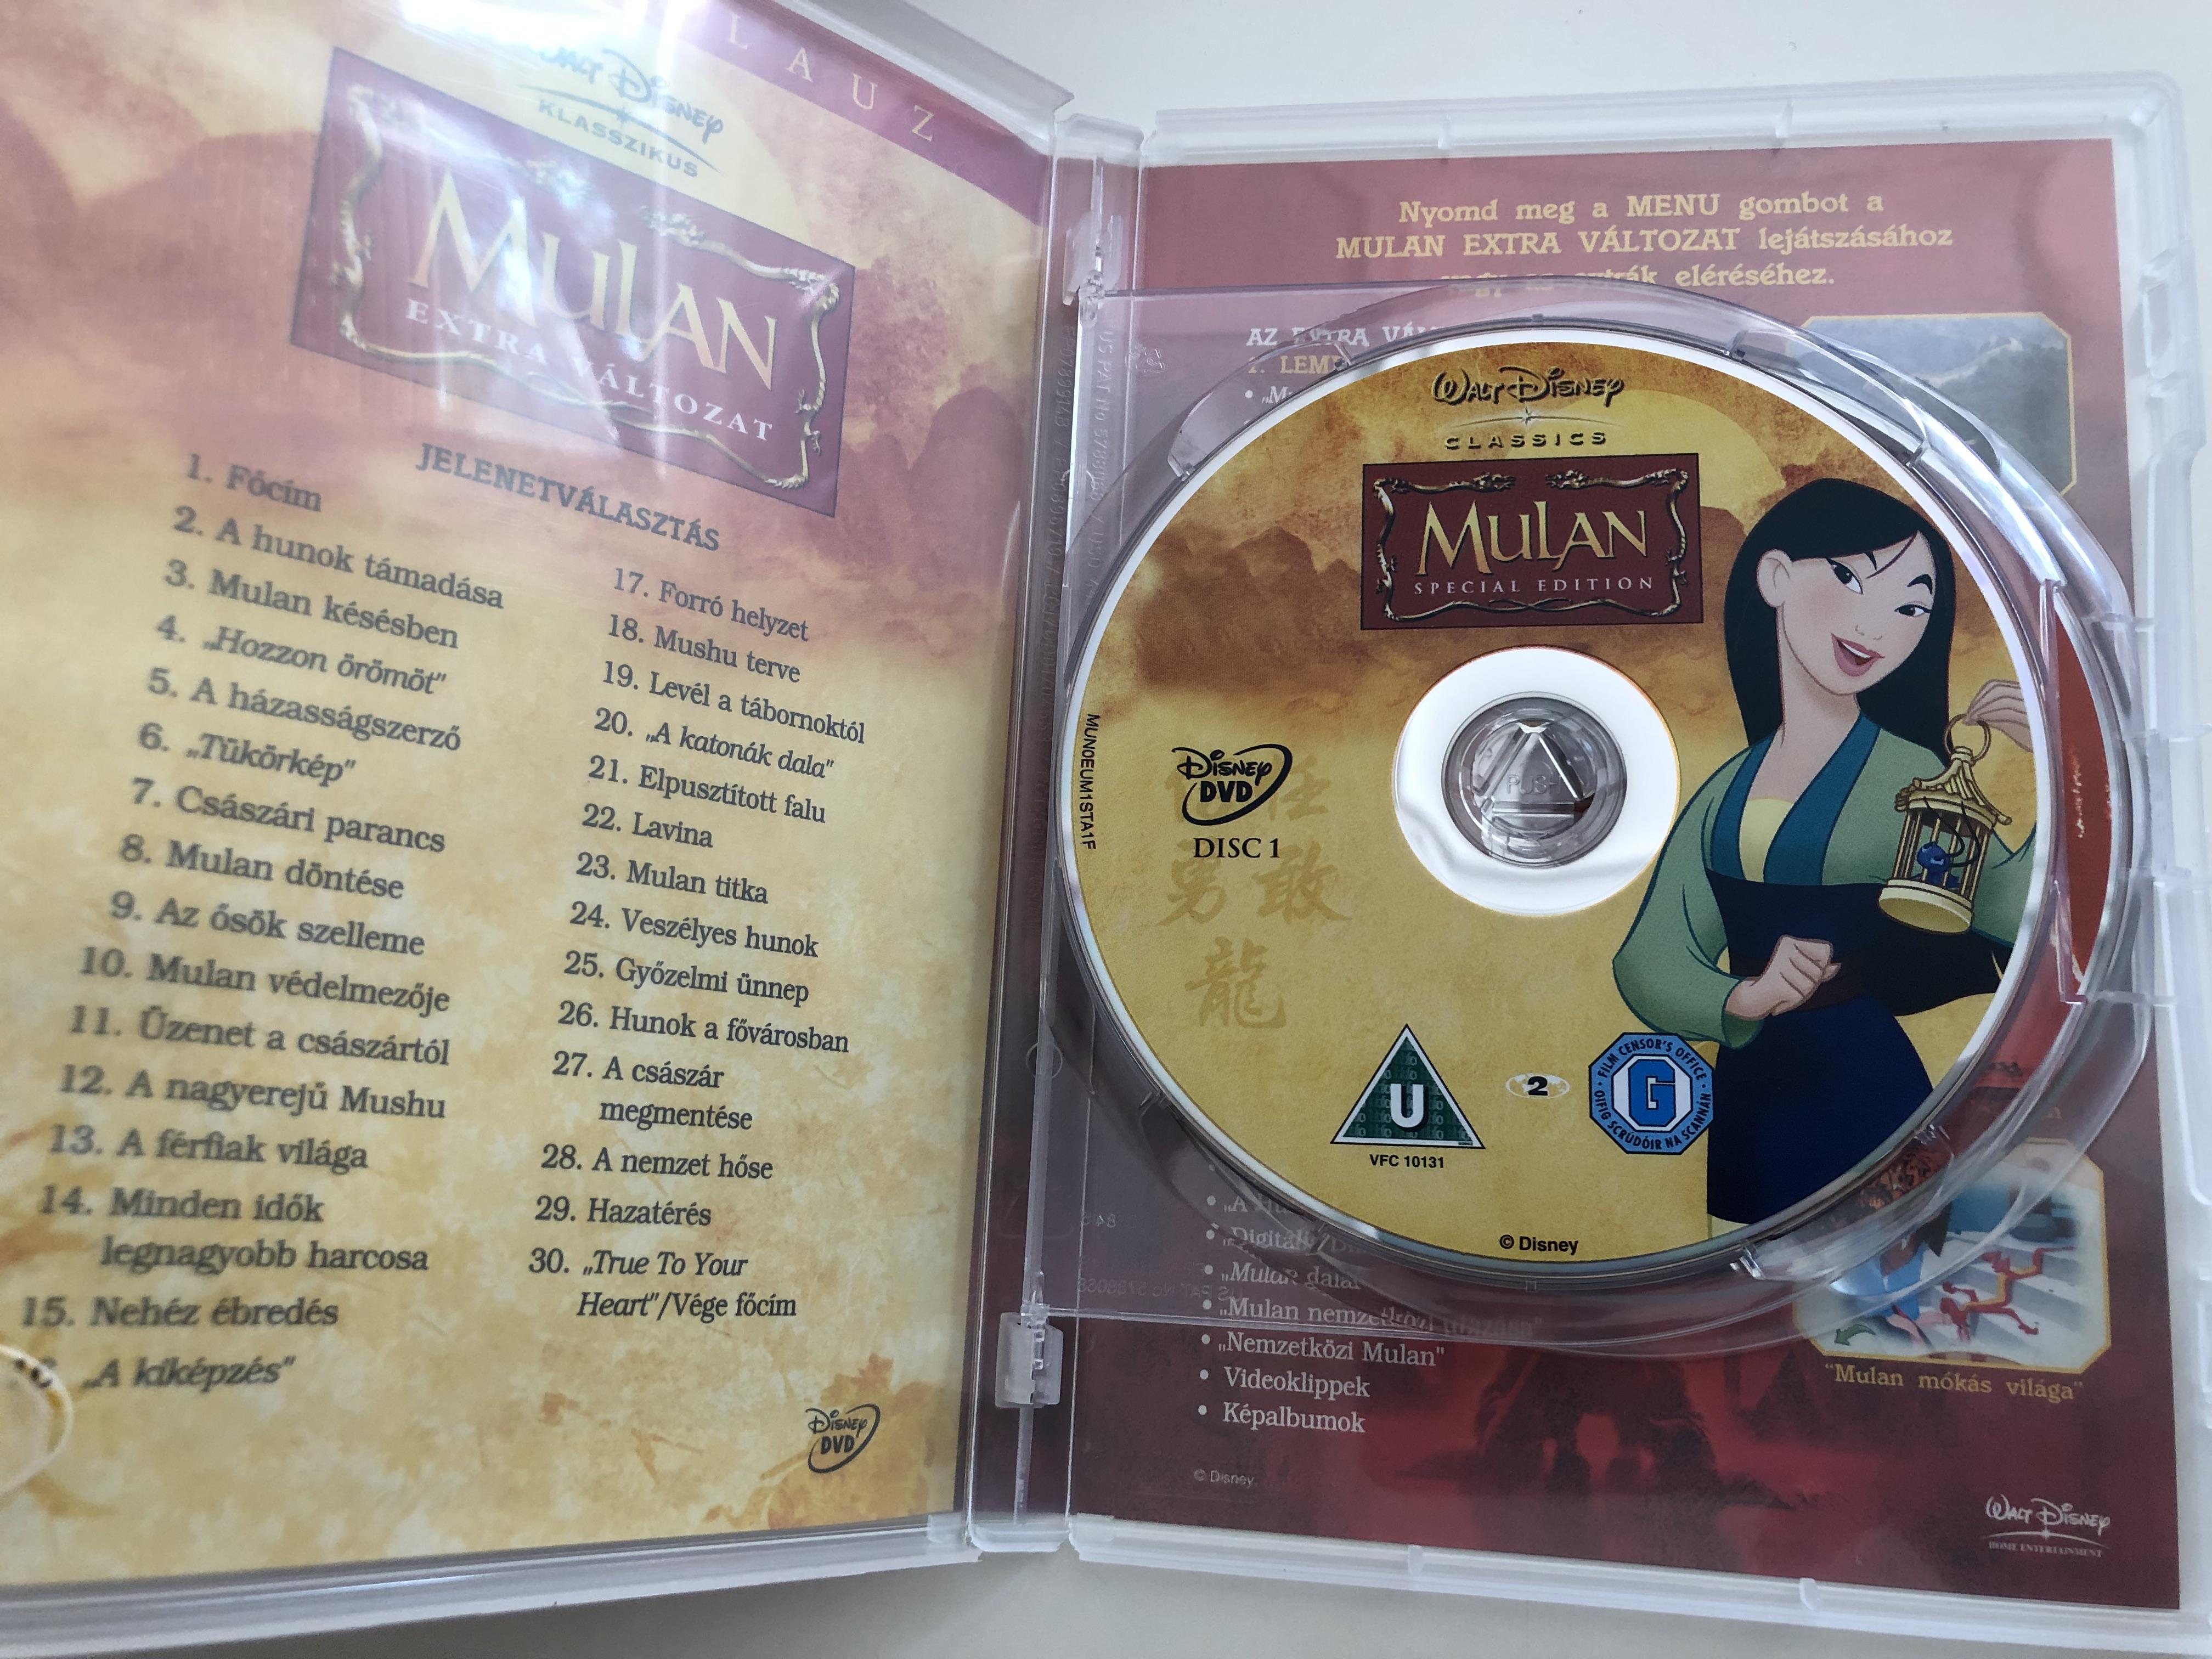 mulan-special-edition-2-dvd-1998-mulan-extra-v-ltozat-duplalemezes-extra-v-ltozat-directed-by-barry-cook-tony-bancroft-starring-ming-na-wen-eddie-murphy-bd-wong-miguel-ferrer-june-foray-2-.jpg